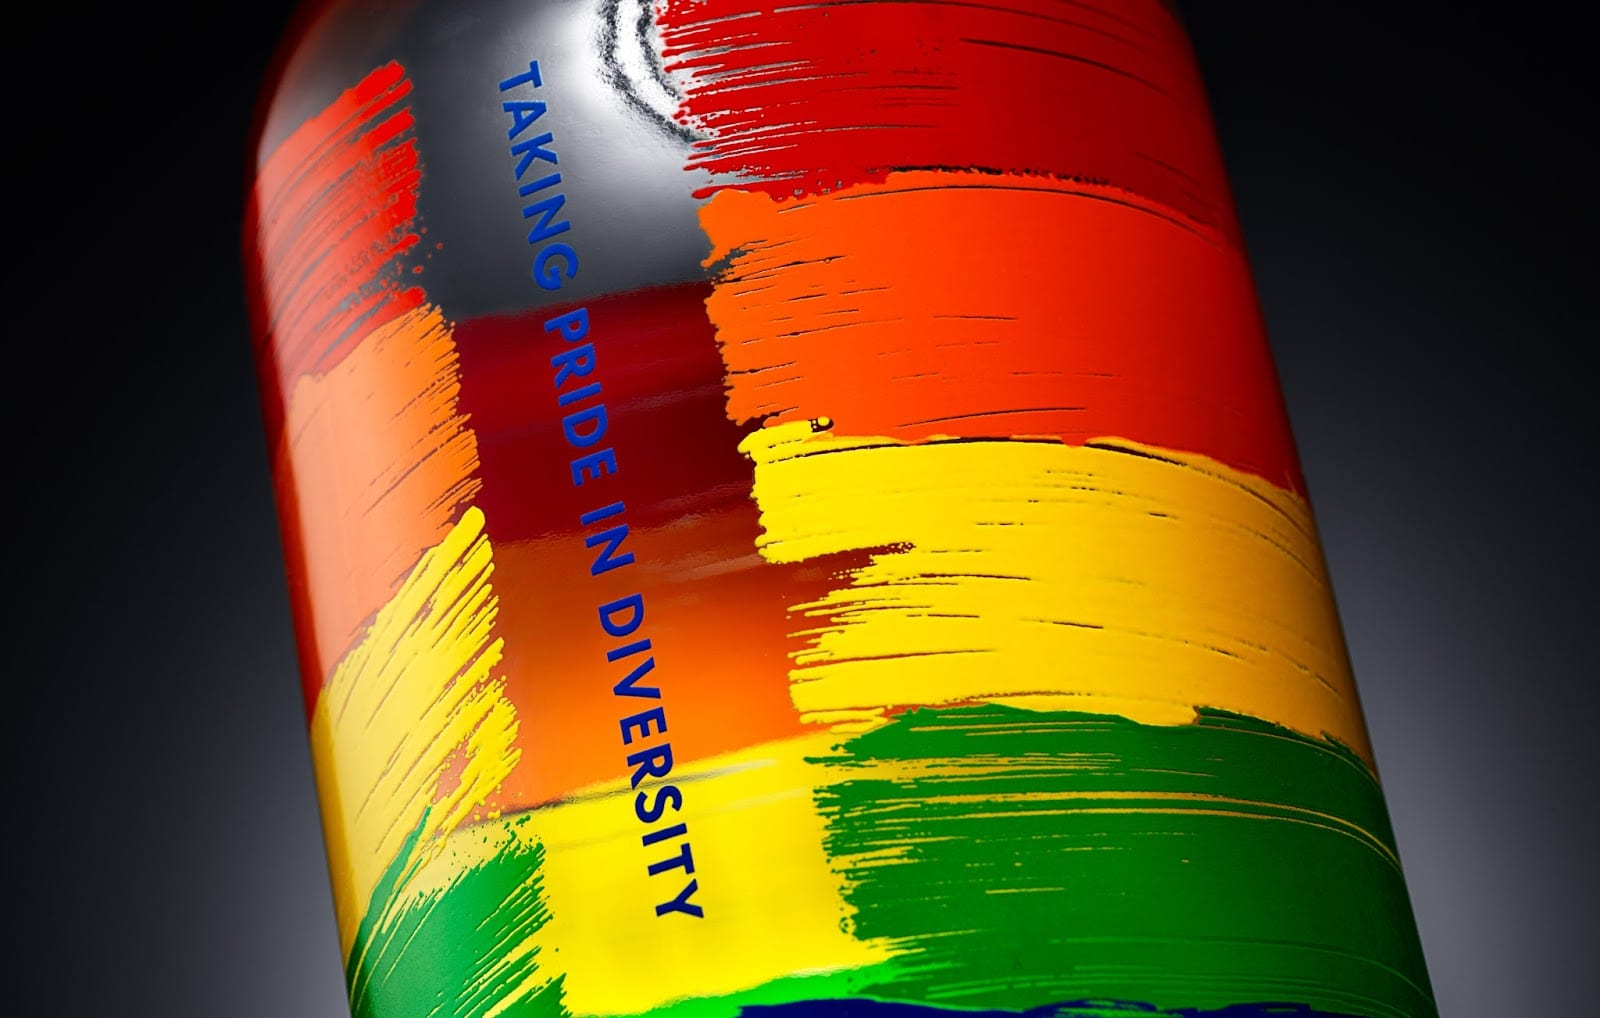 pond design absolut pride 3 - Absolut Rainbow Flag Edition – Pýcha v rozmanitosti